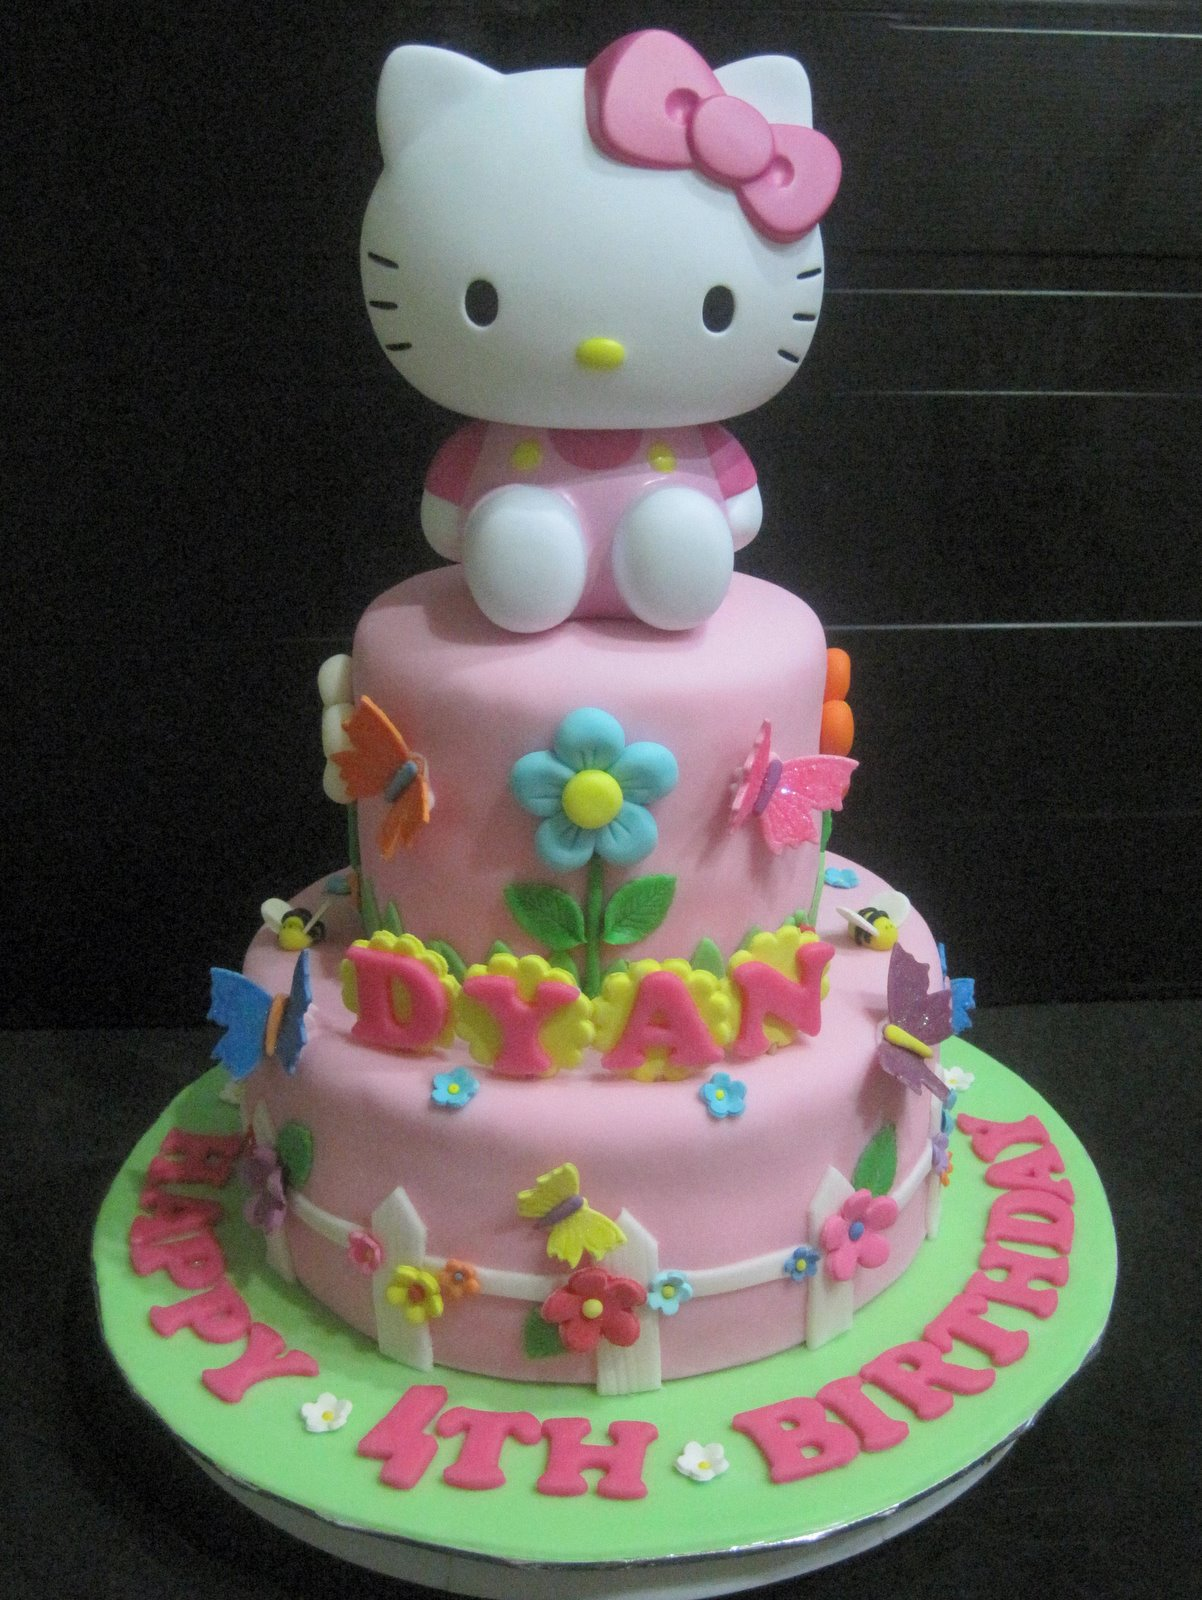 Cupcake Divinity Hello Kitty Garden Theme Cake